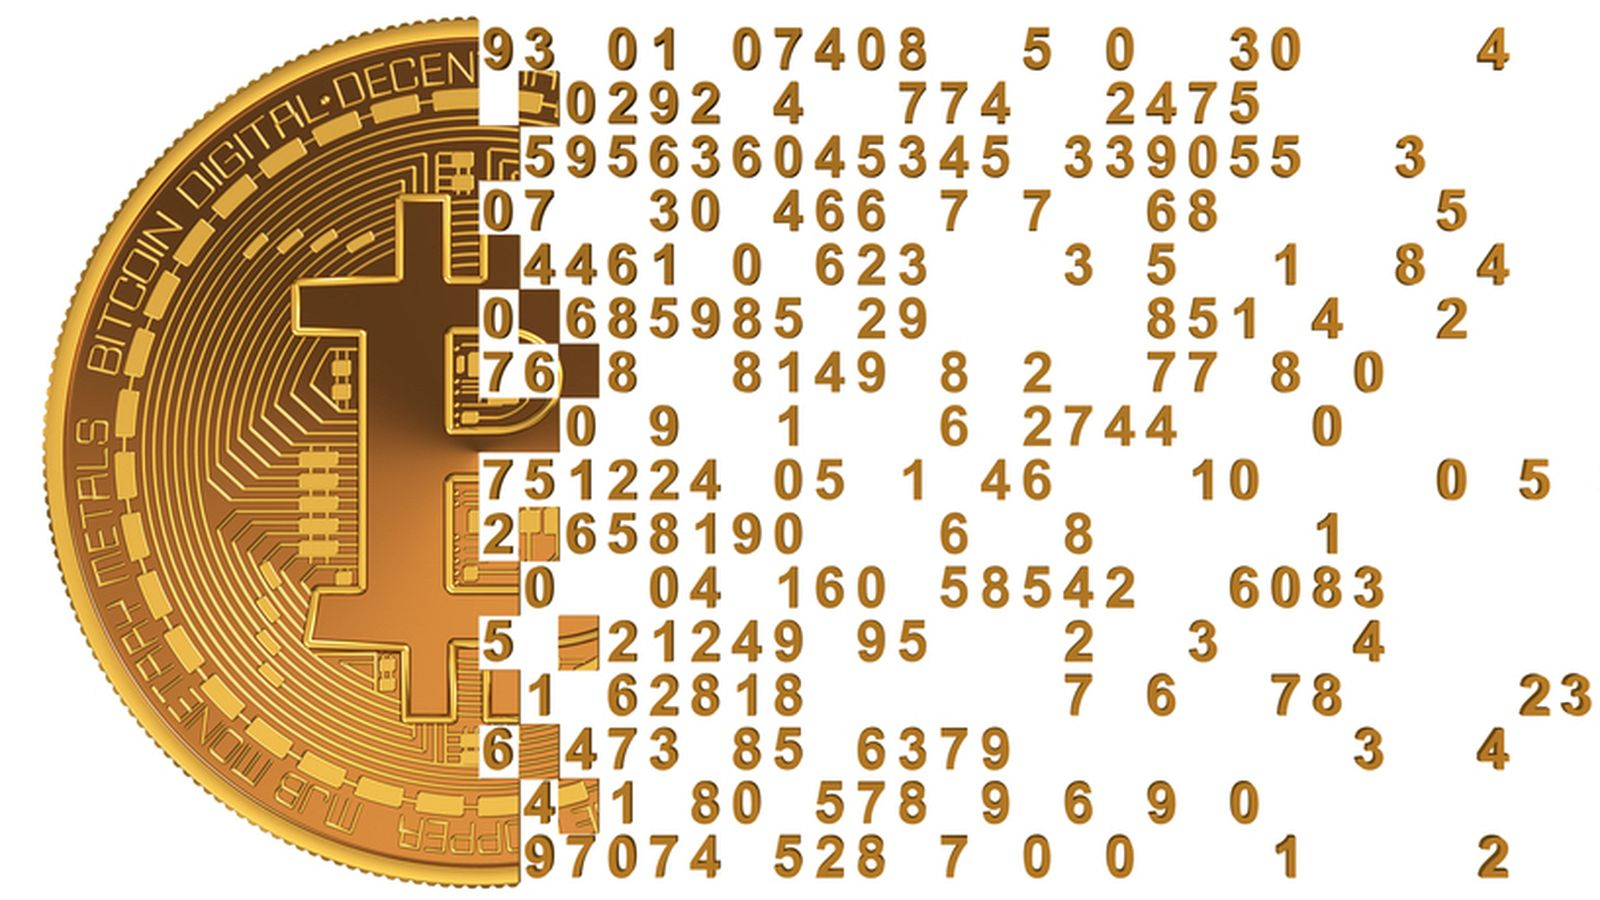 Алекс форк биткоин больше чем деньги pdf-15